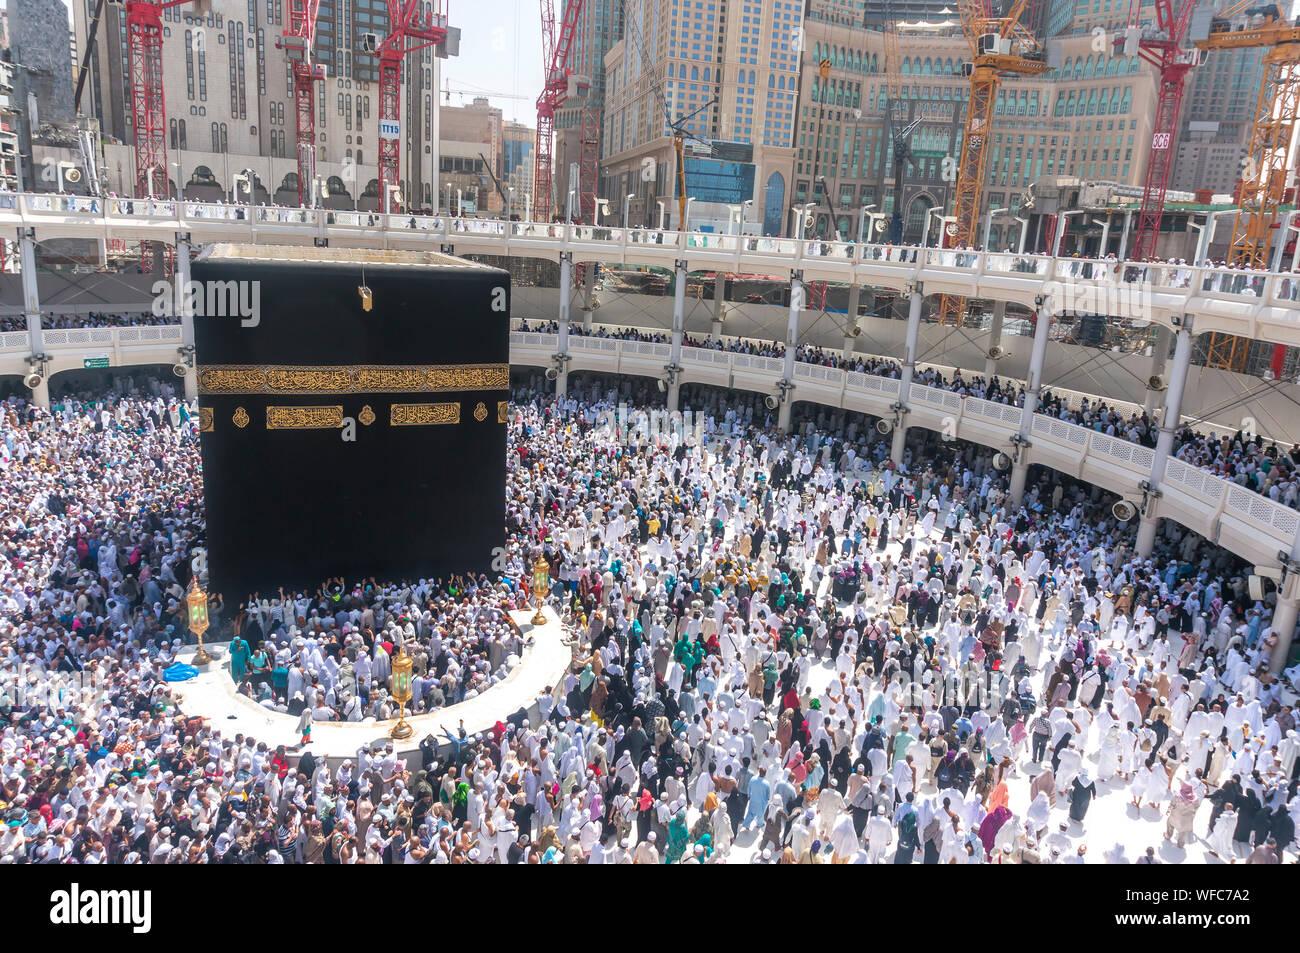 Kaaba Night Stock Photos & Kaaba Night Stock Images - Alamy